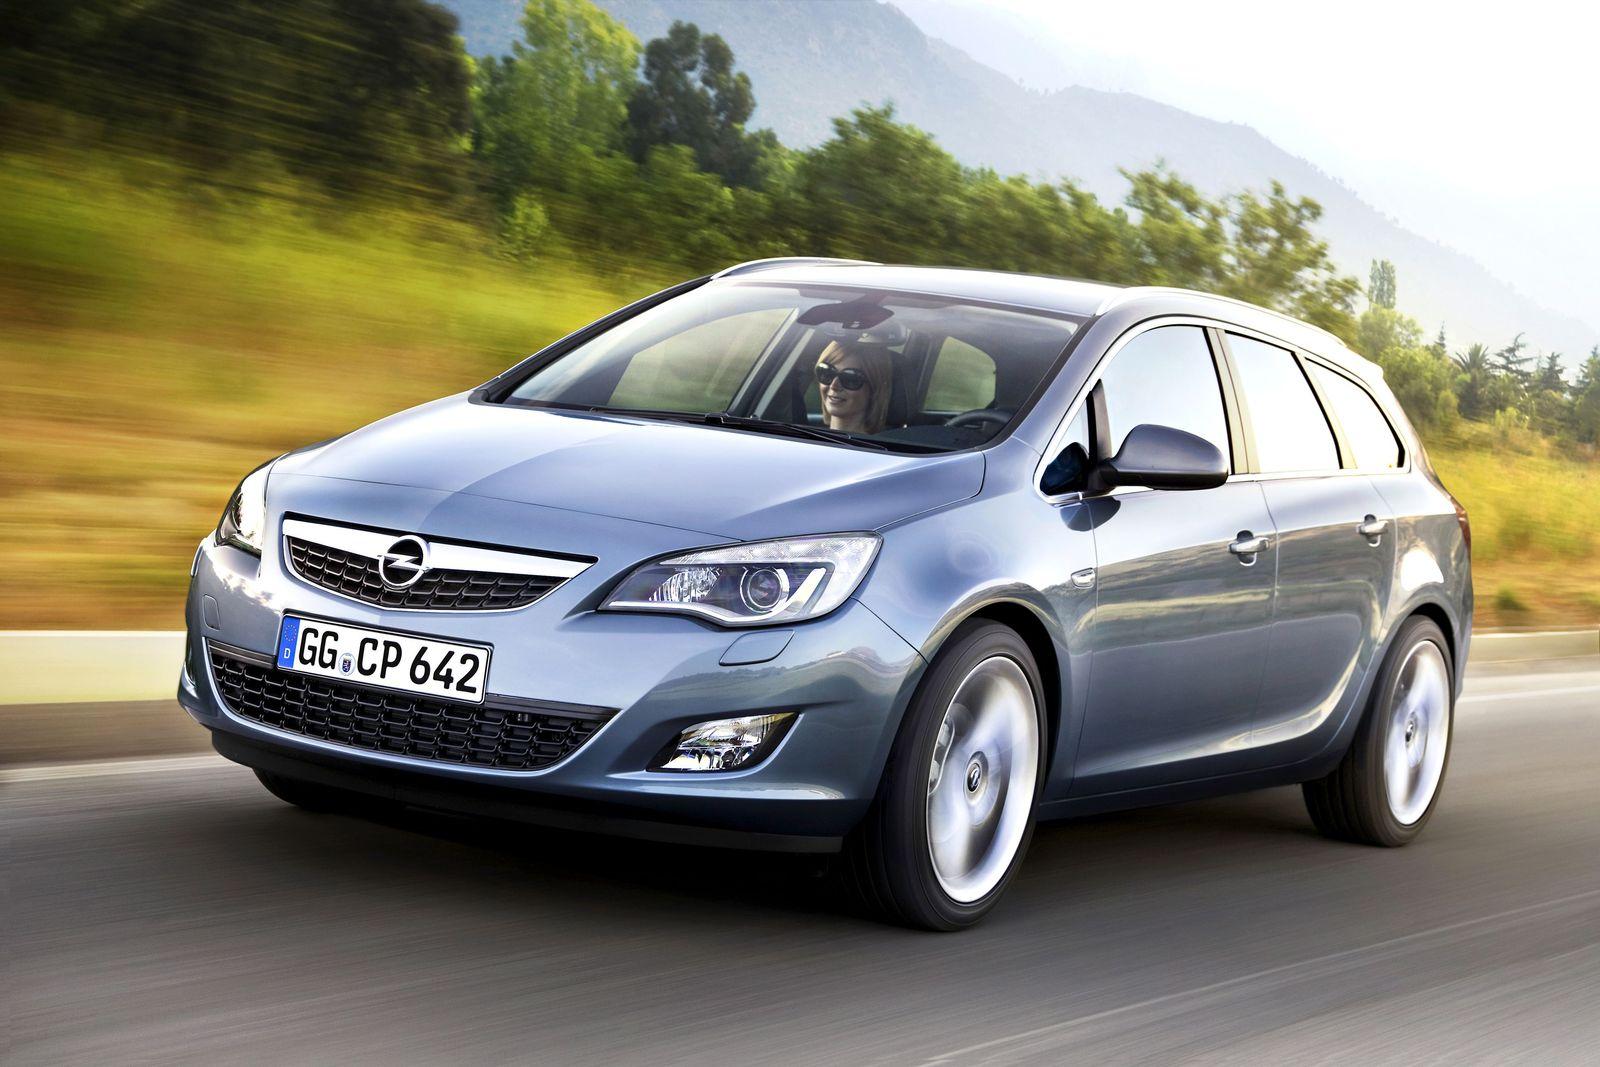 Paris-Autokarussell / Opel Astra Sports Tourer